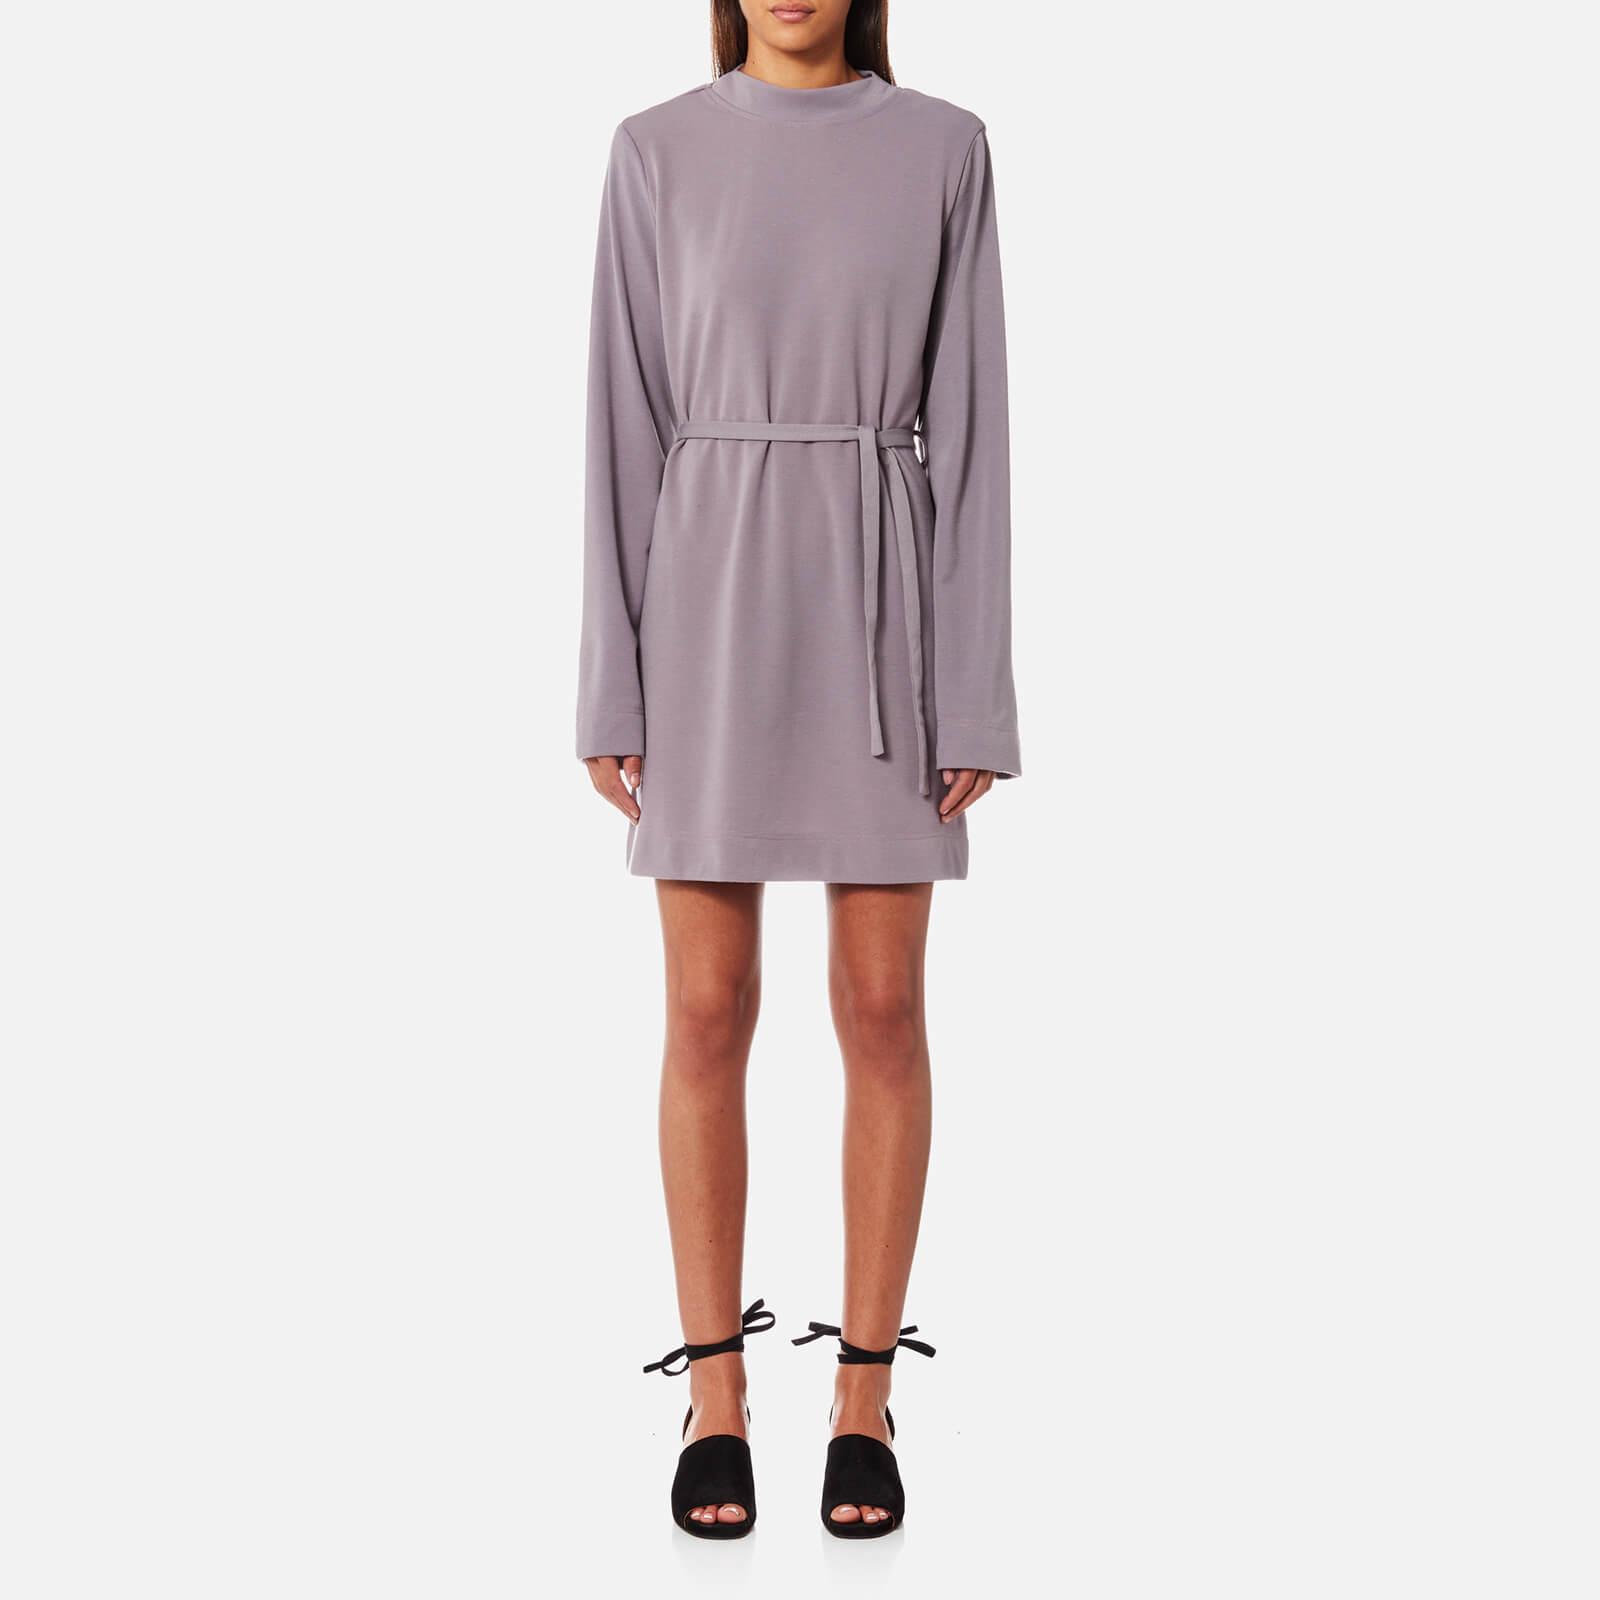 House of Sunny Women's Kicker T-Shirt Long Sleeve Dress - Sweet Lilac - UK 10 - Purple